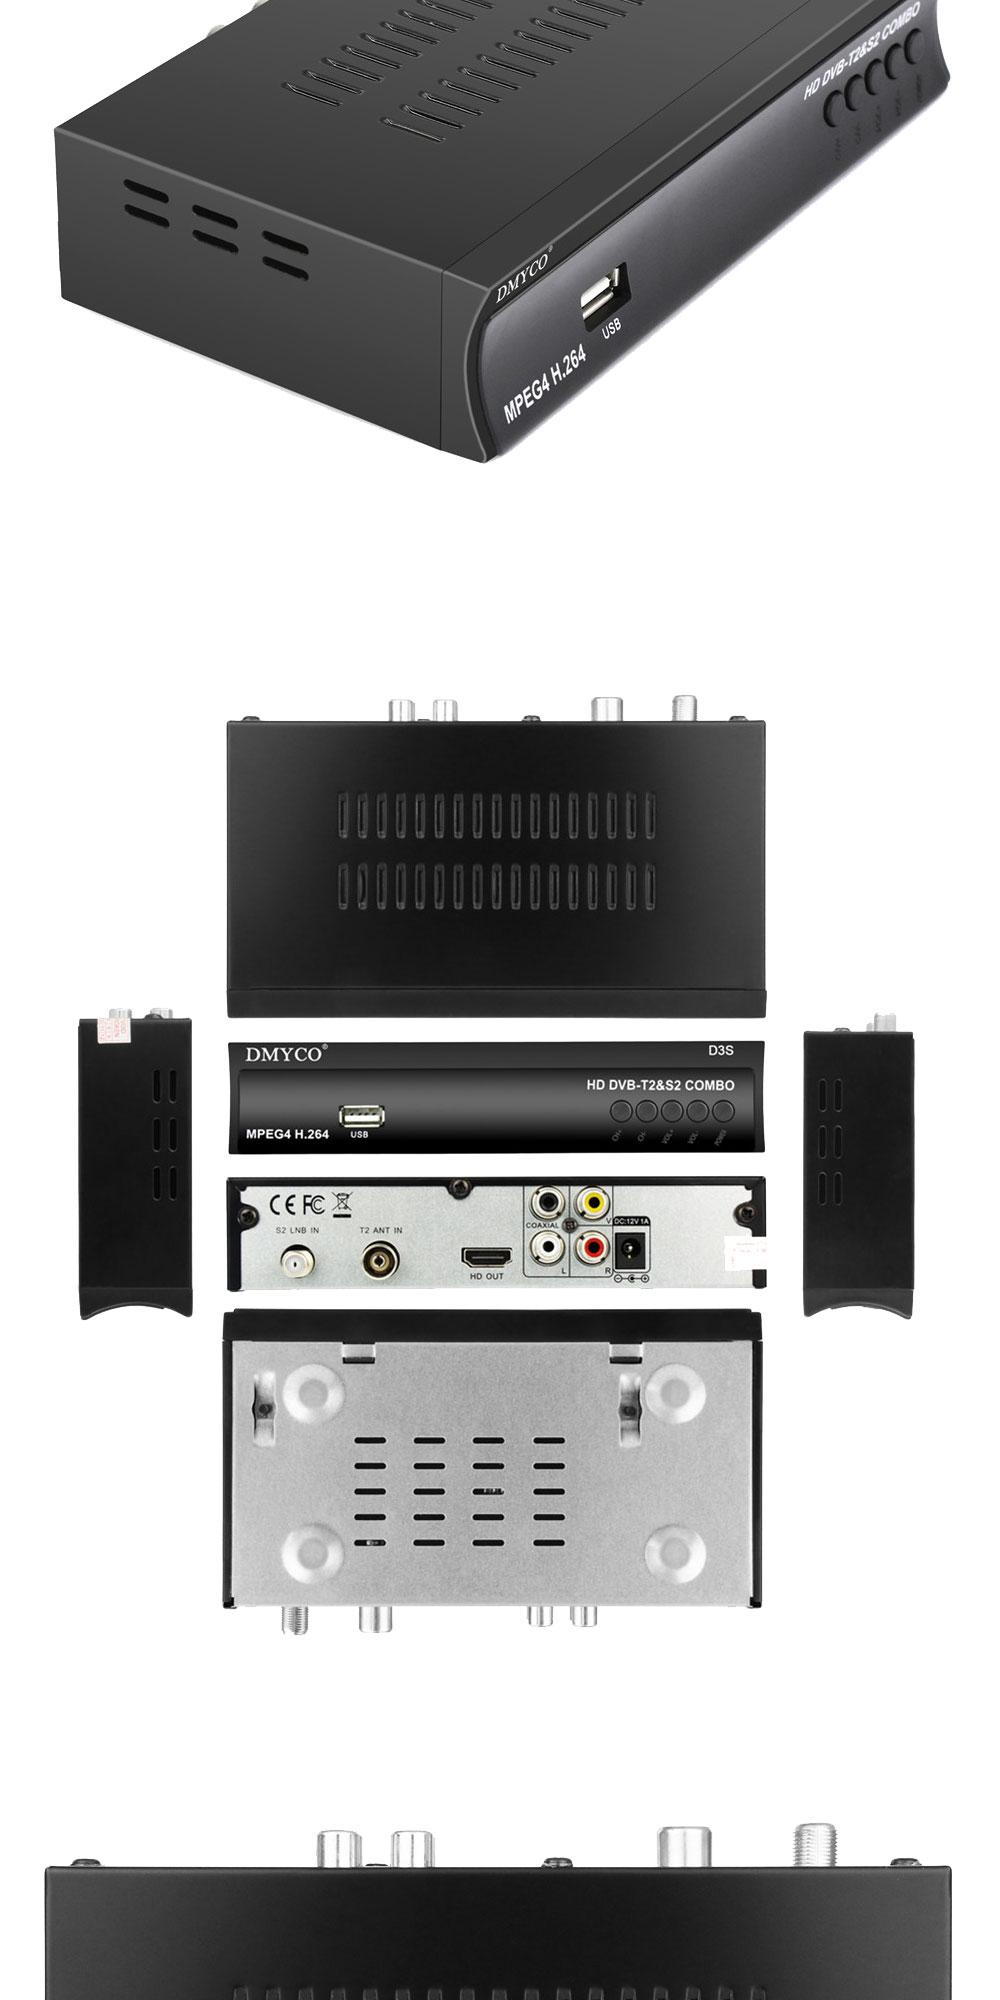 HD DVB T2 S2 bo world Satellite Receiver FTA Terrestrial TV Tuner H 264 MPEG 2 MPEG 4 DVB T2 DVB S2 Clines Smart Media Player